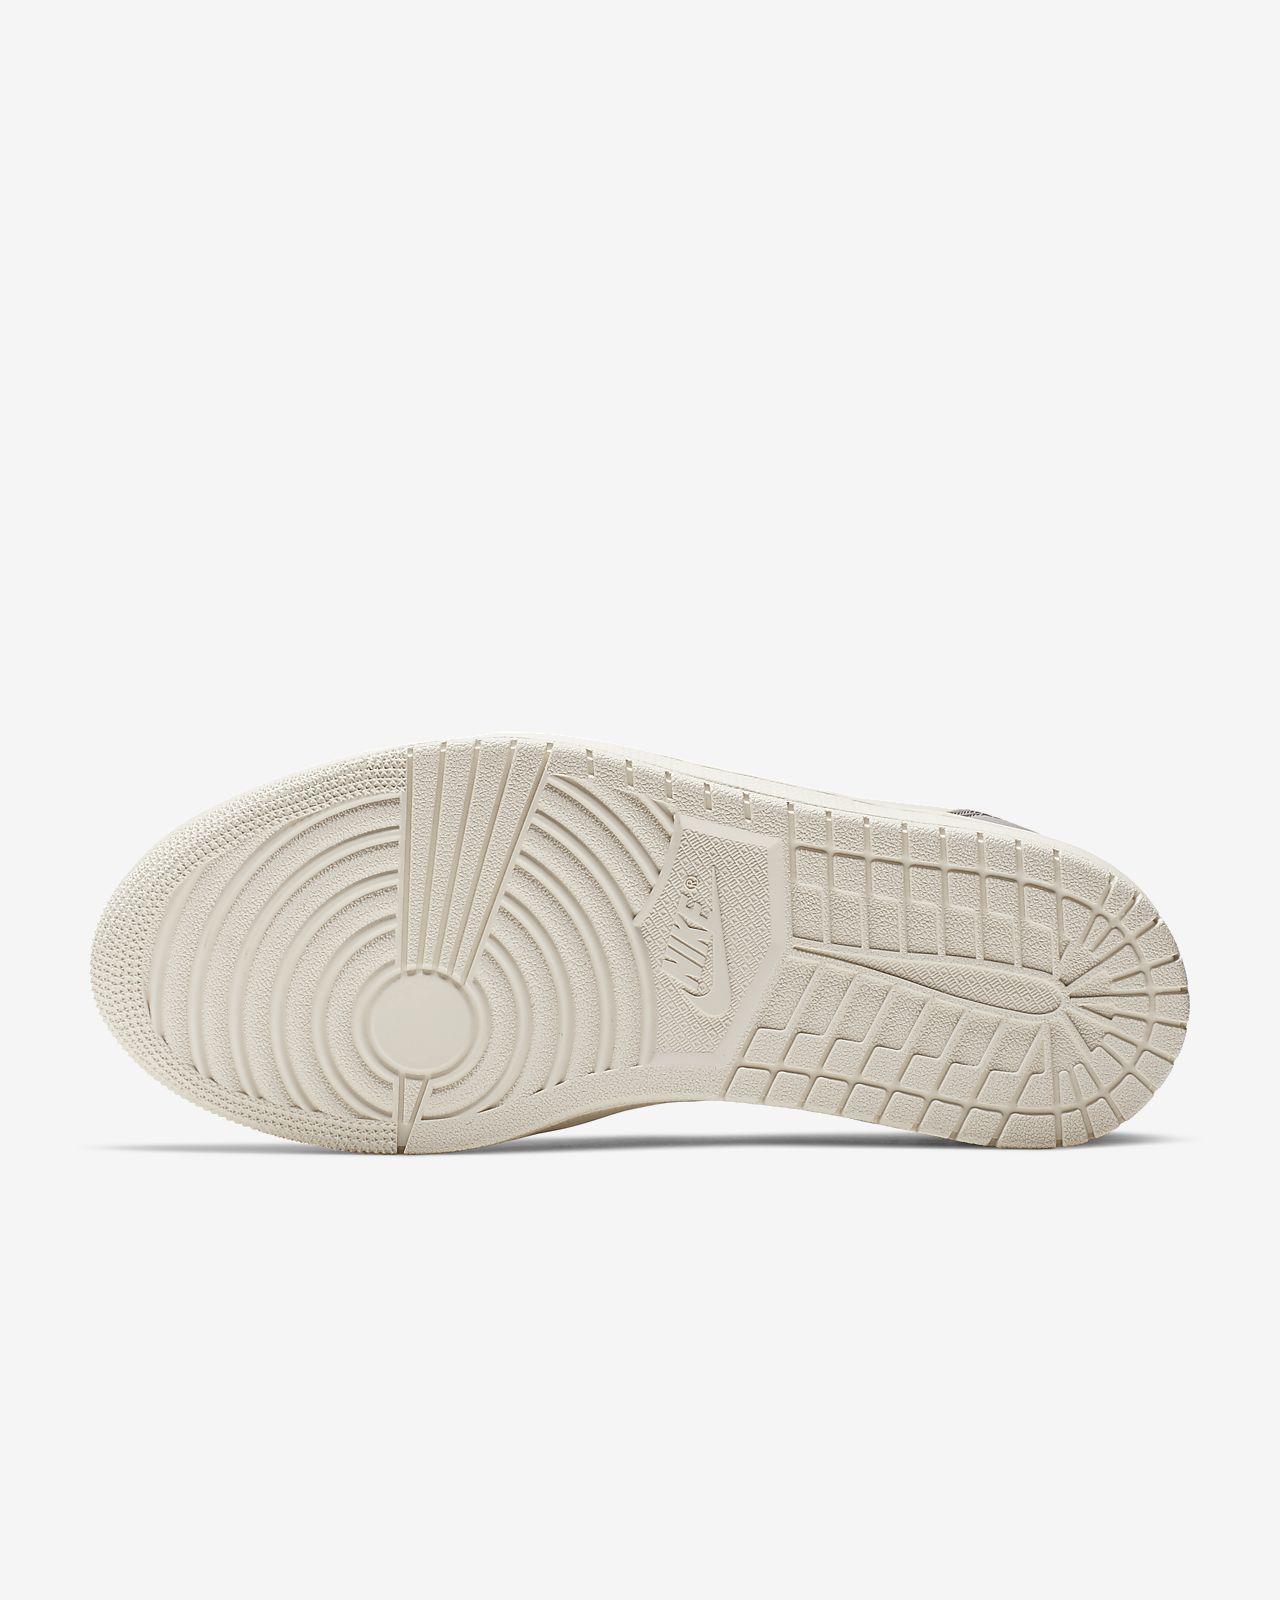 636d36524fc Air Jordan 1 Retro Low Slip Women's Shoe. Nike.com